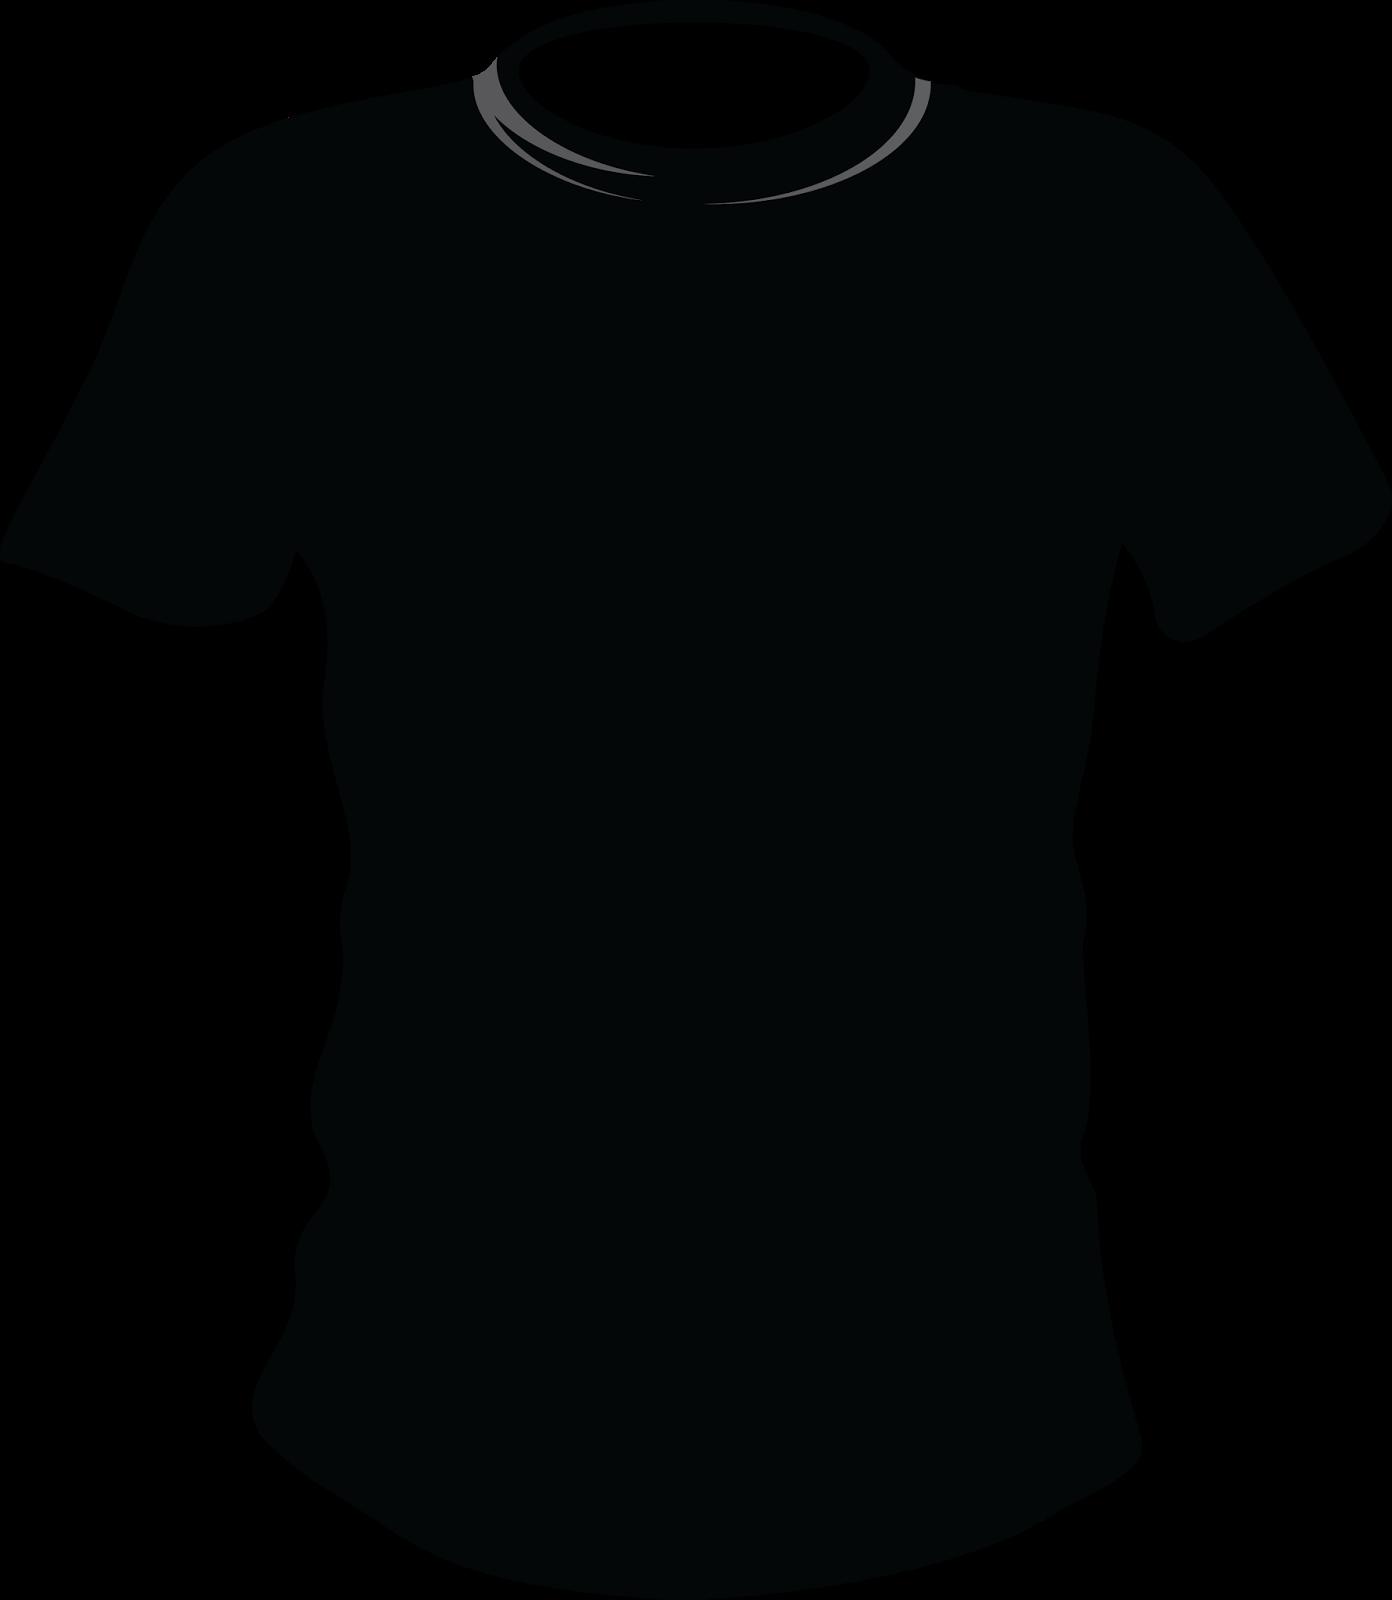 Shirt template vector art download t vectors male models for Vector art for t shirts